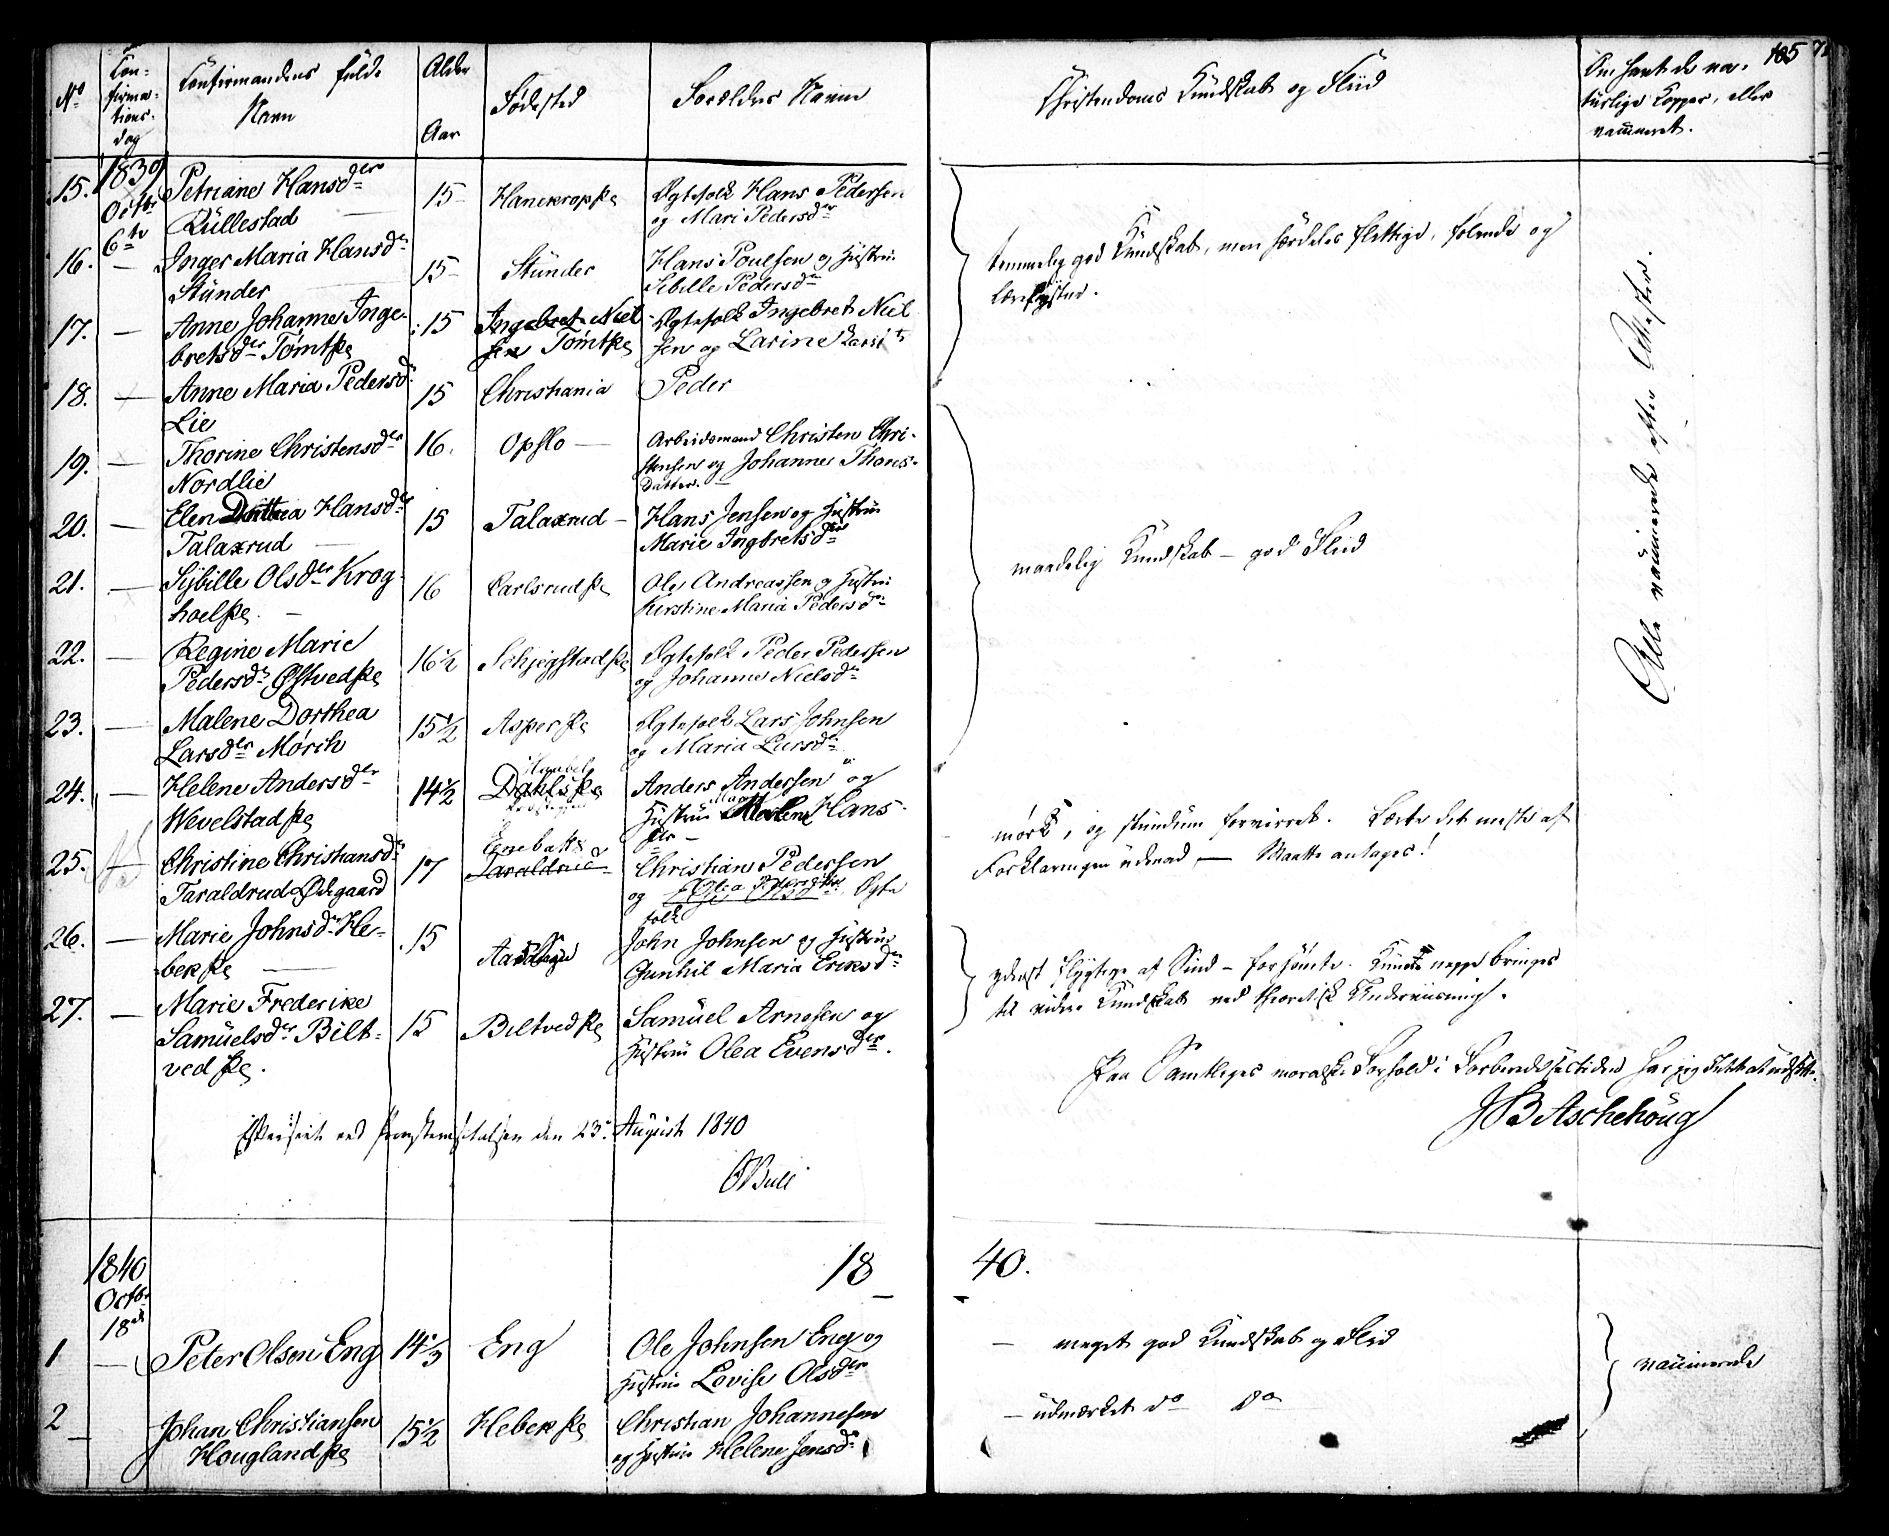 SAO, Kråkstad prestekontor Kirkebøker, F/Fa/L0005: Ministerialbok nr. I 5, 1837-1847, s. 105